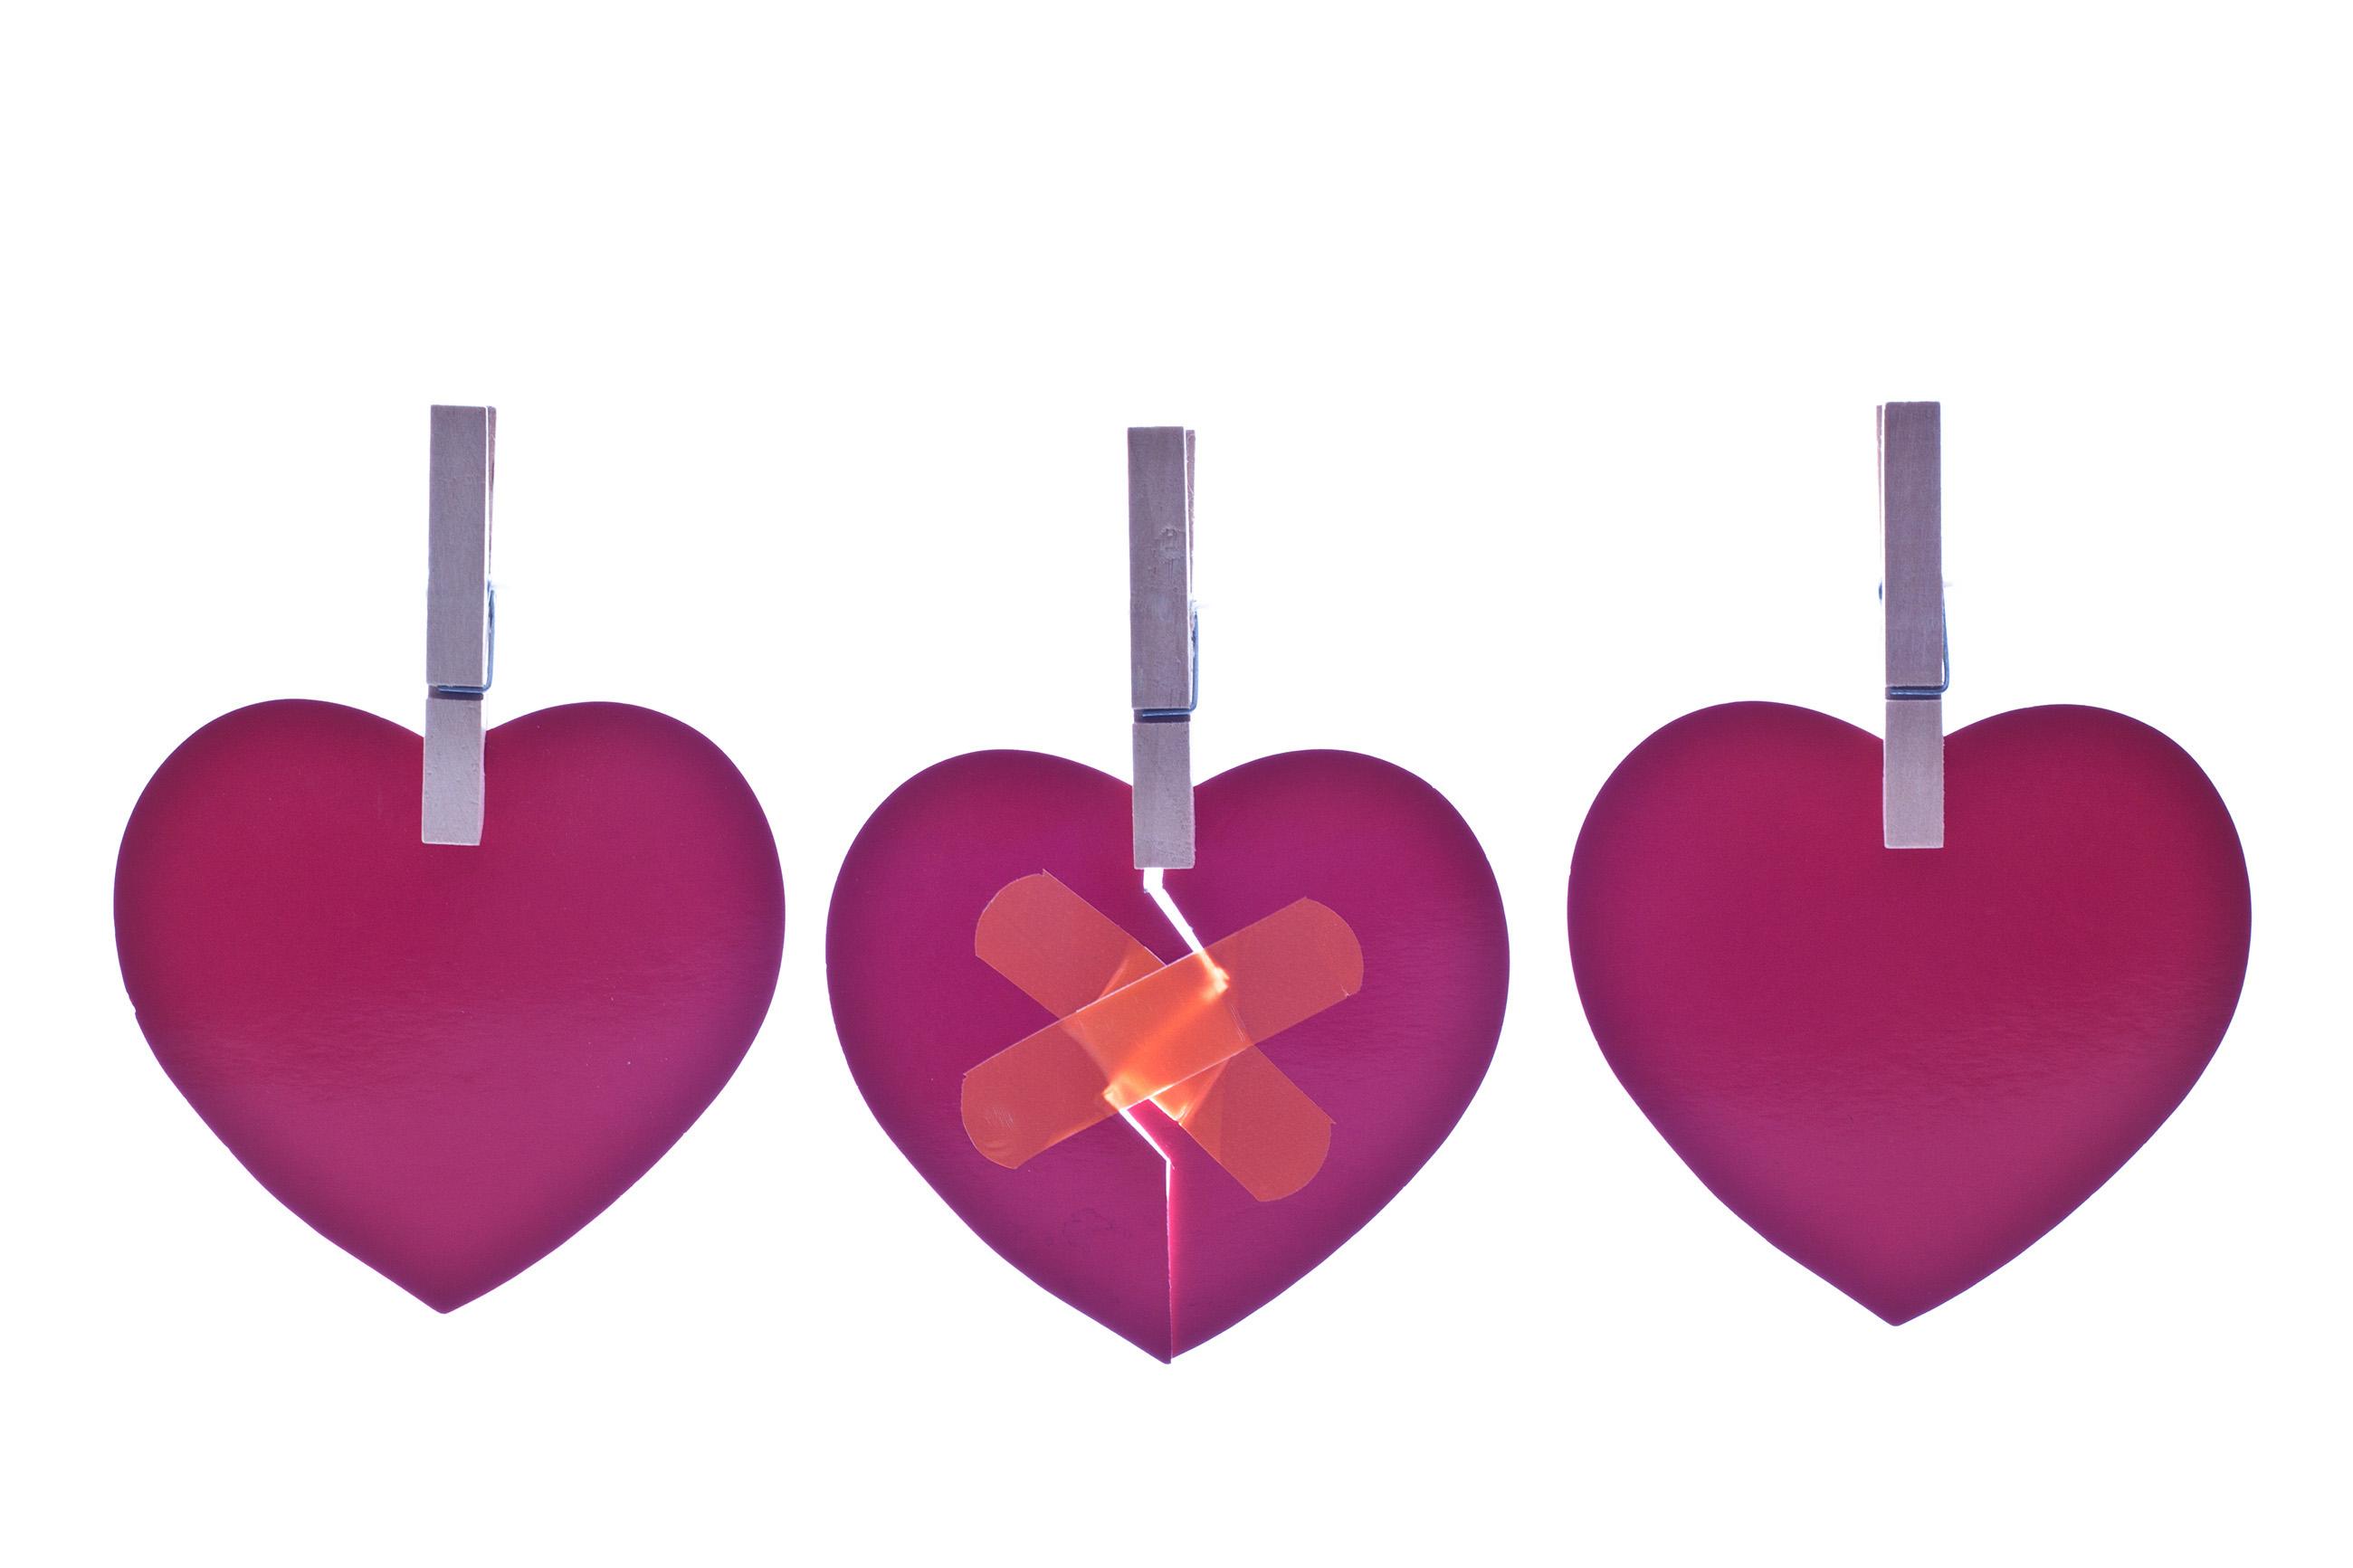 Hearts, Aid, Red, Lovers, Macro, HQ Photo